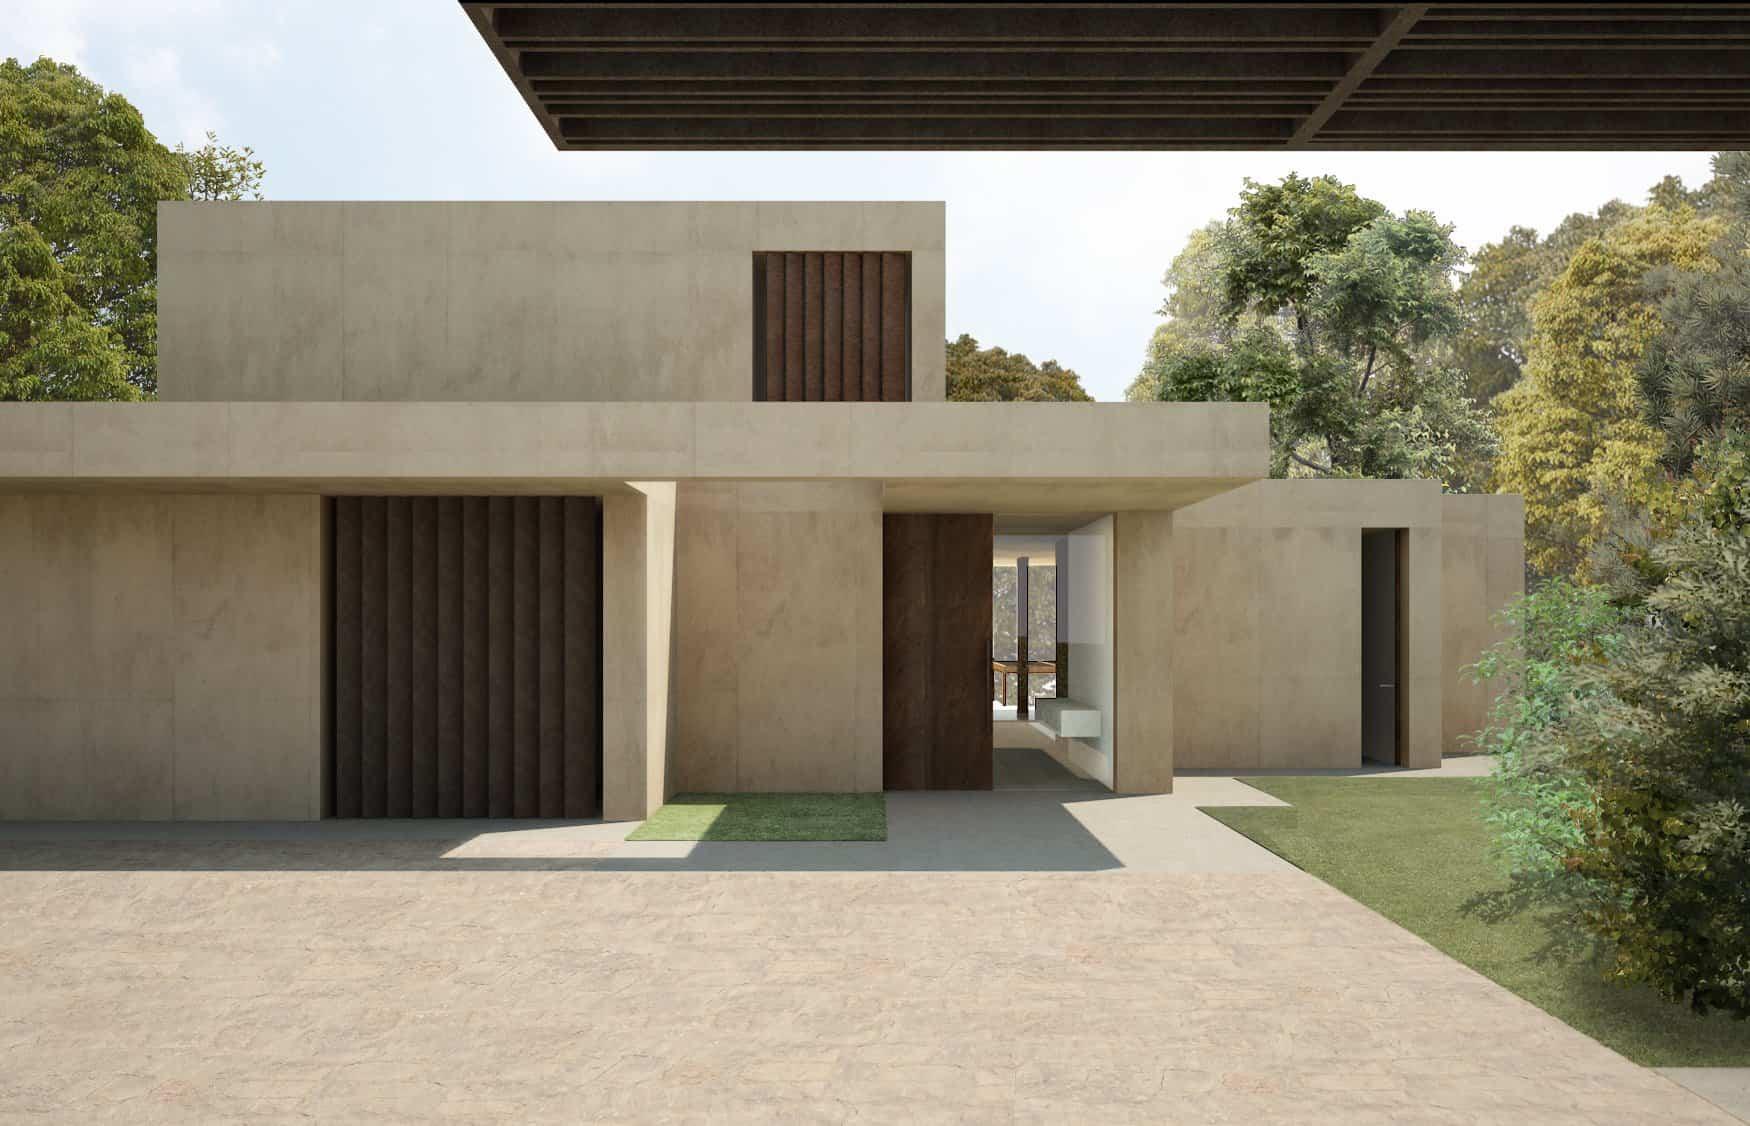 naturaleza en la paleta de colores casa en la pinada 2015 arquitecto ramon esteve 18 - Ramon Esteve Arquitecto